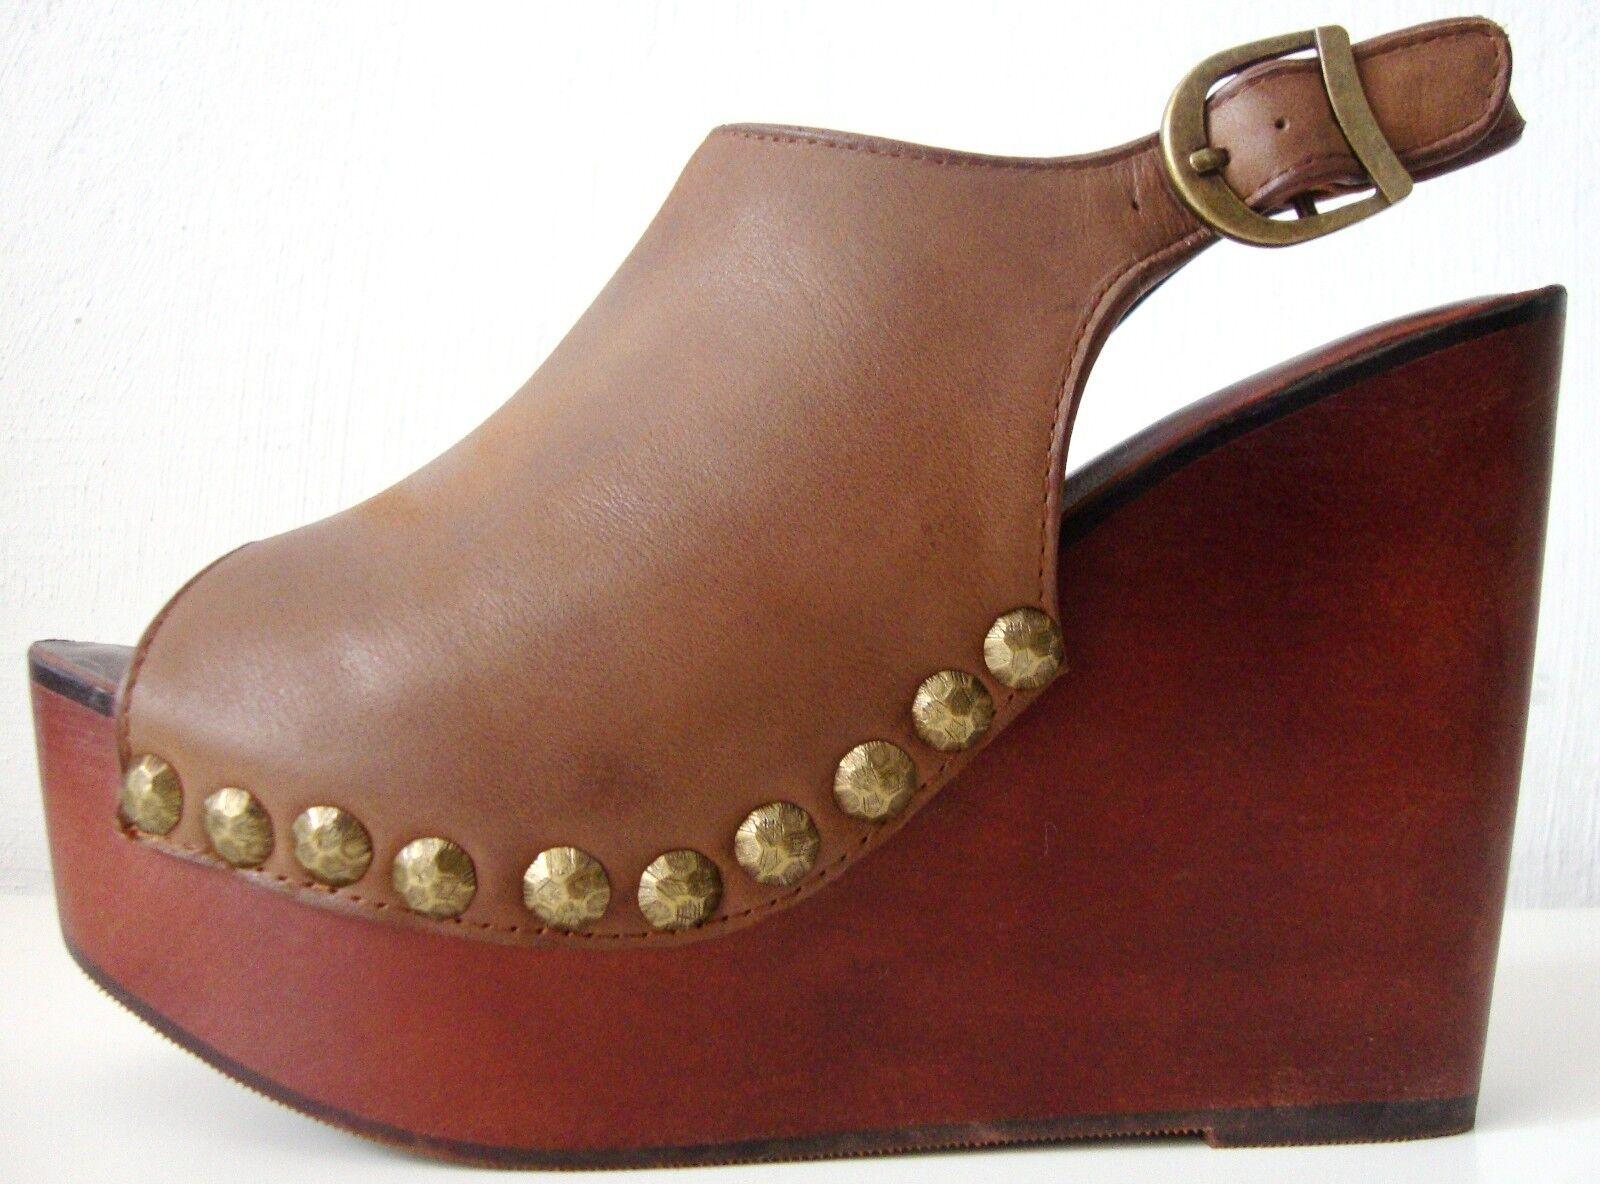 JEFFREY CAMPBELL SNICK STUD Schuhe Platform Sandales Damen Plateau Schuhe STUD Leder Gr39 NEU c86563